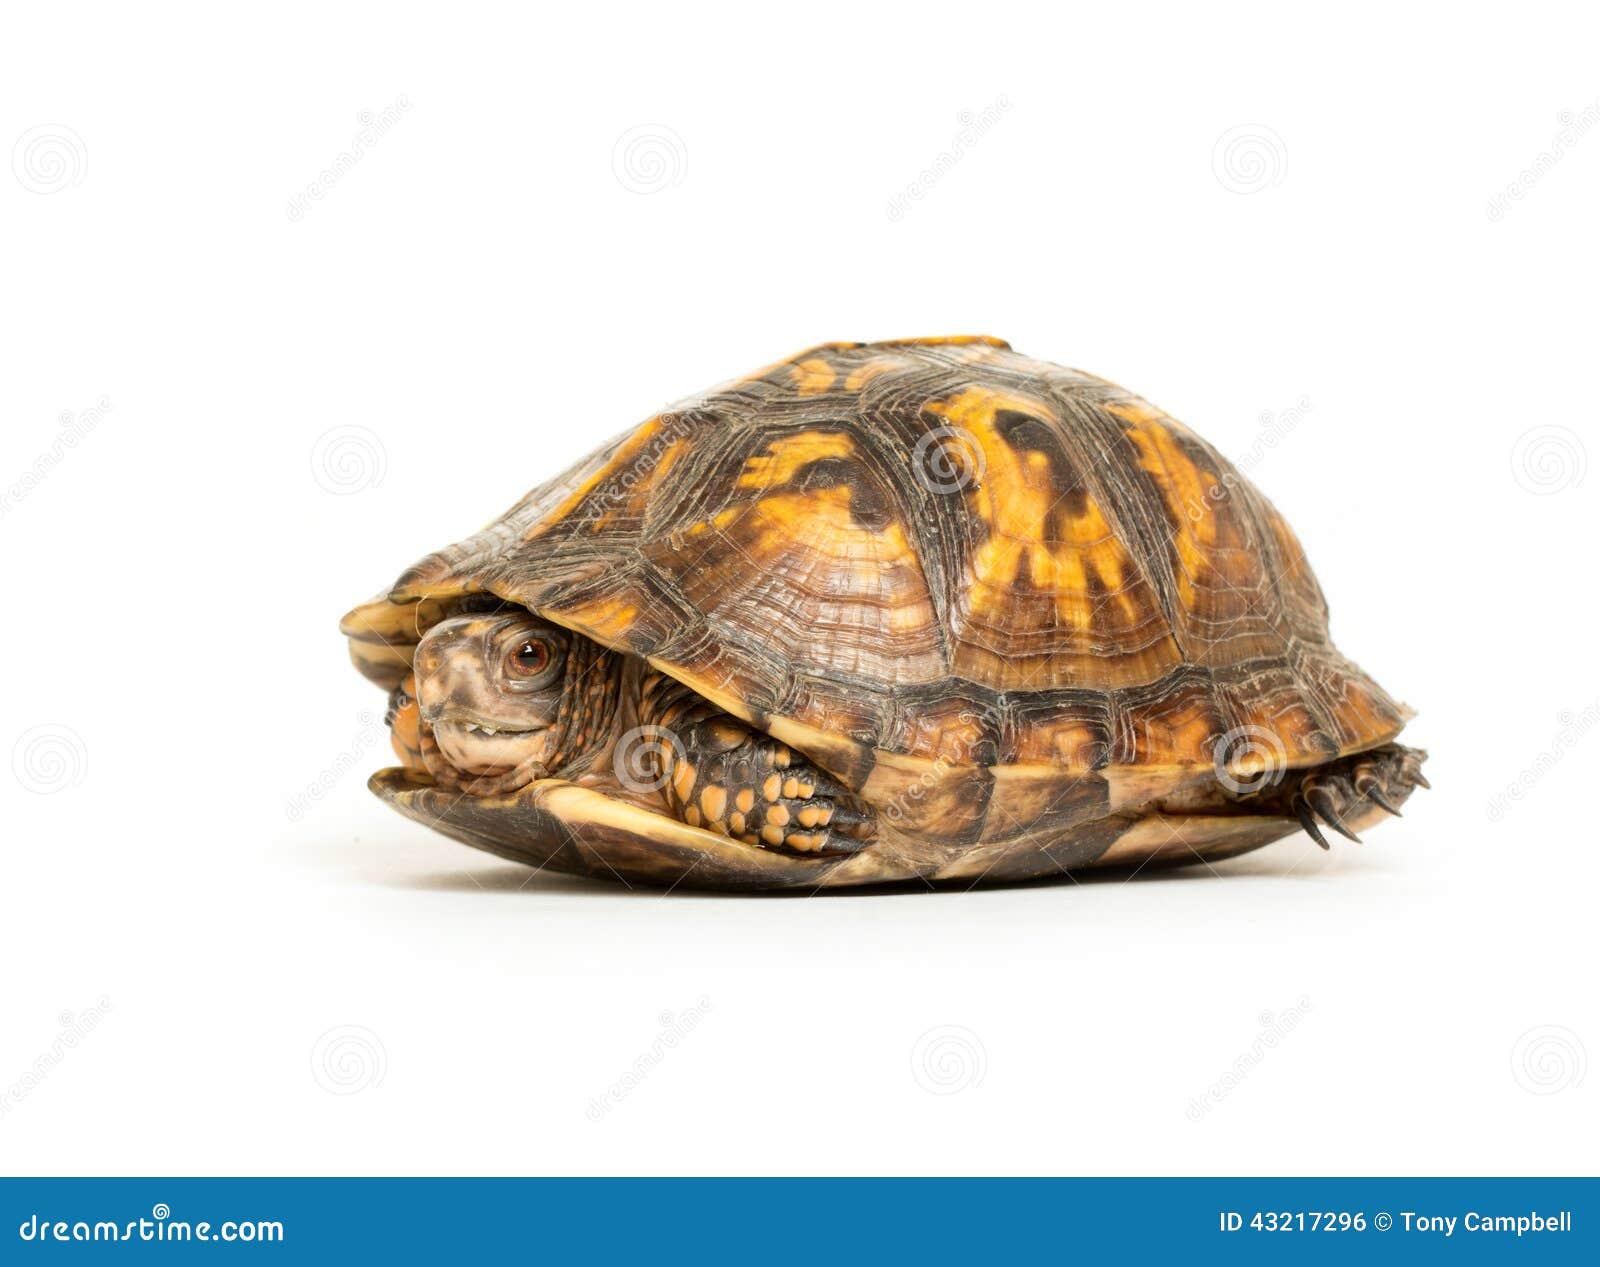 eastern box turtle stock photo image 43217296